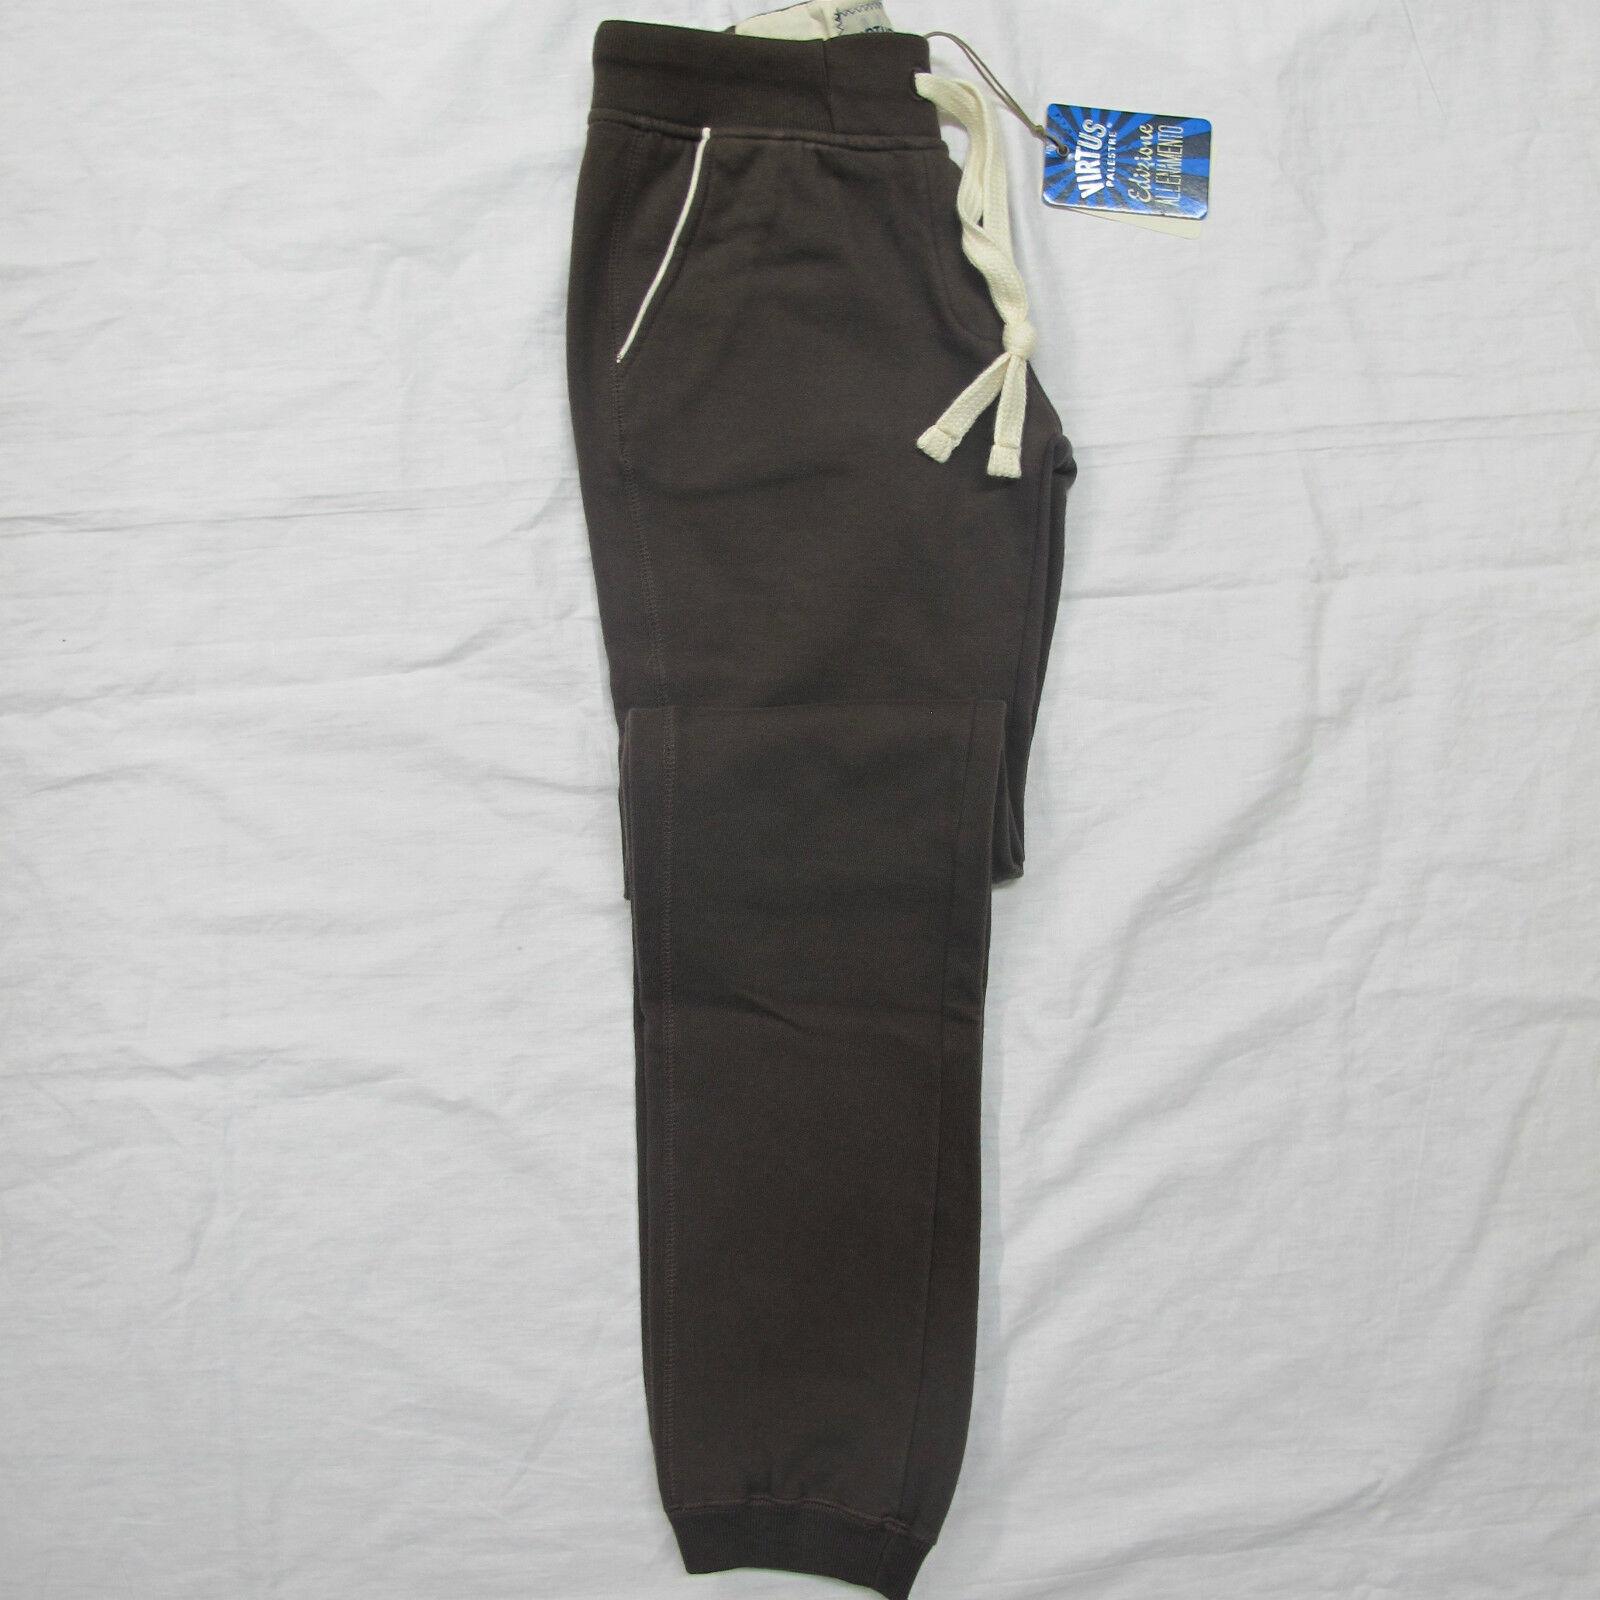 VIRTUS PALESTRE pantaloni donna felpa art.C2VP1900590D col.MarroneeE tg.L INV.'13